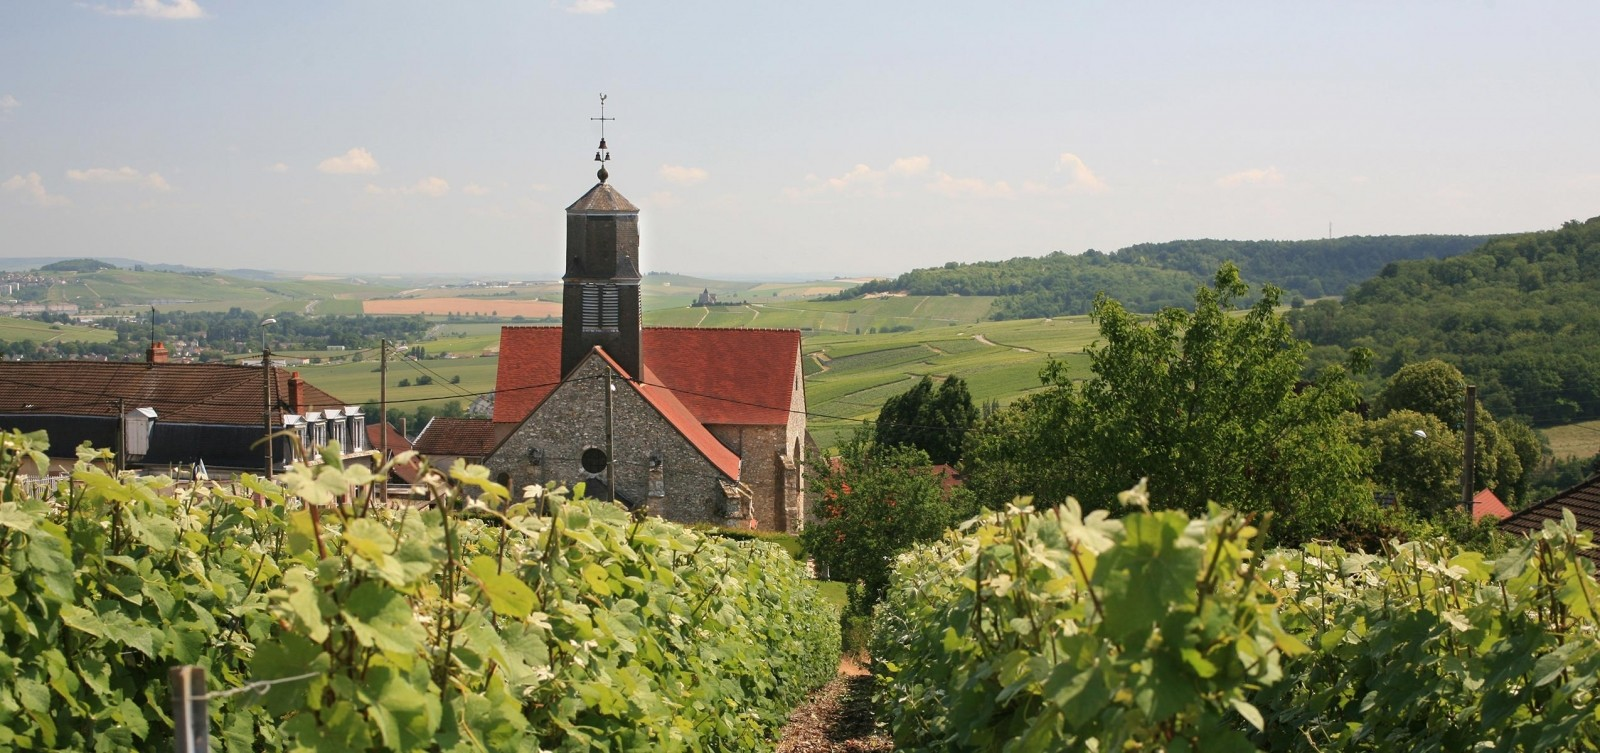 BRUGNY-VAUDANCOURT - photo du village